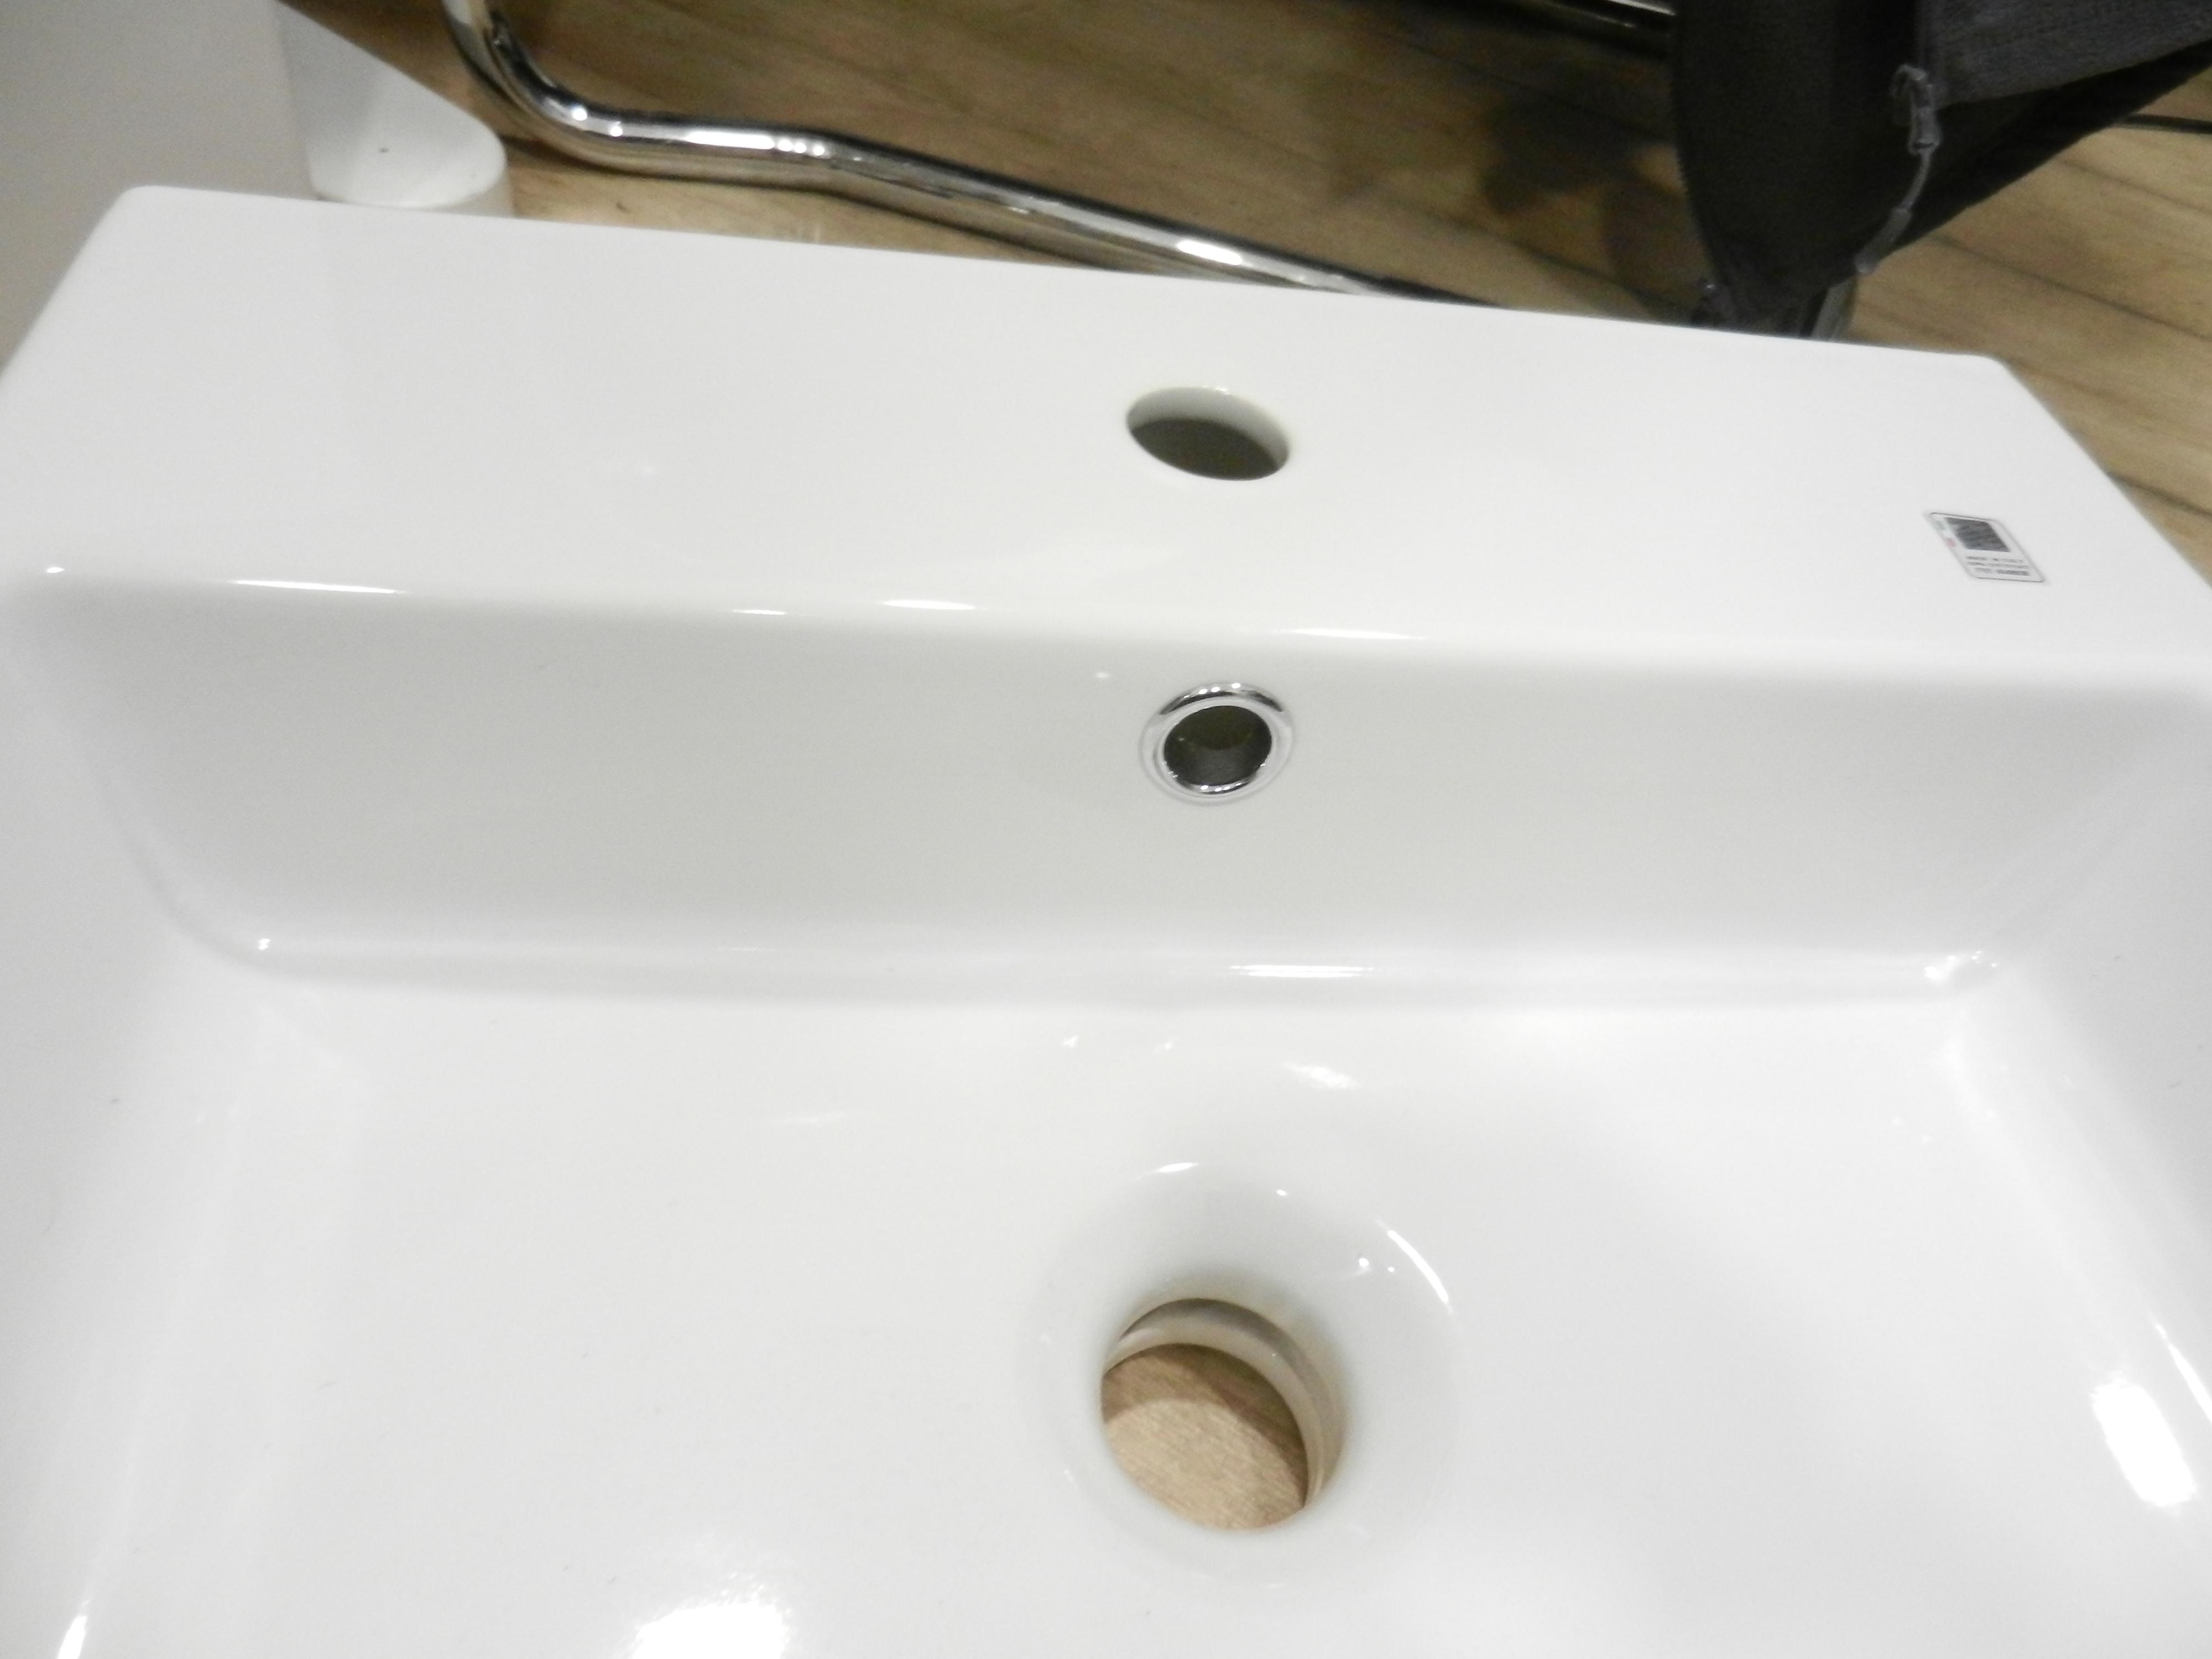 Italian Made Square Basin 46cm x 46cm 1 Tap Hole